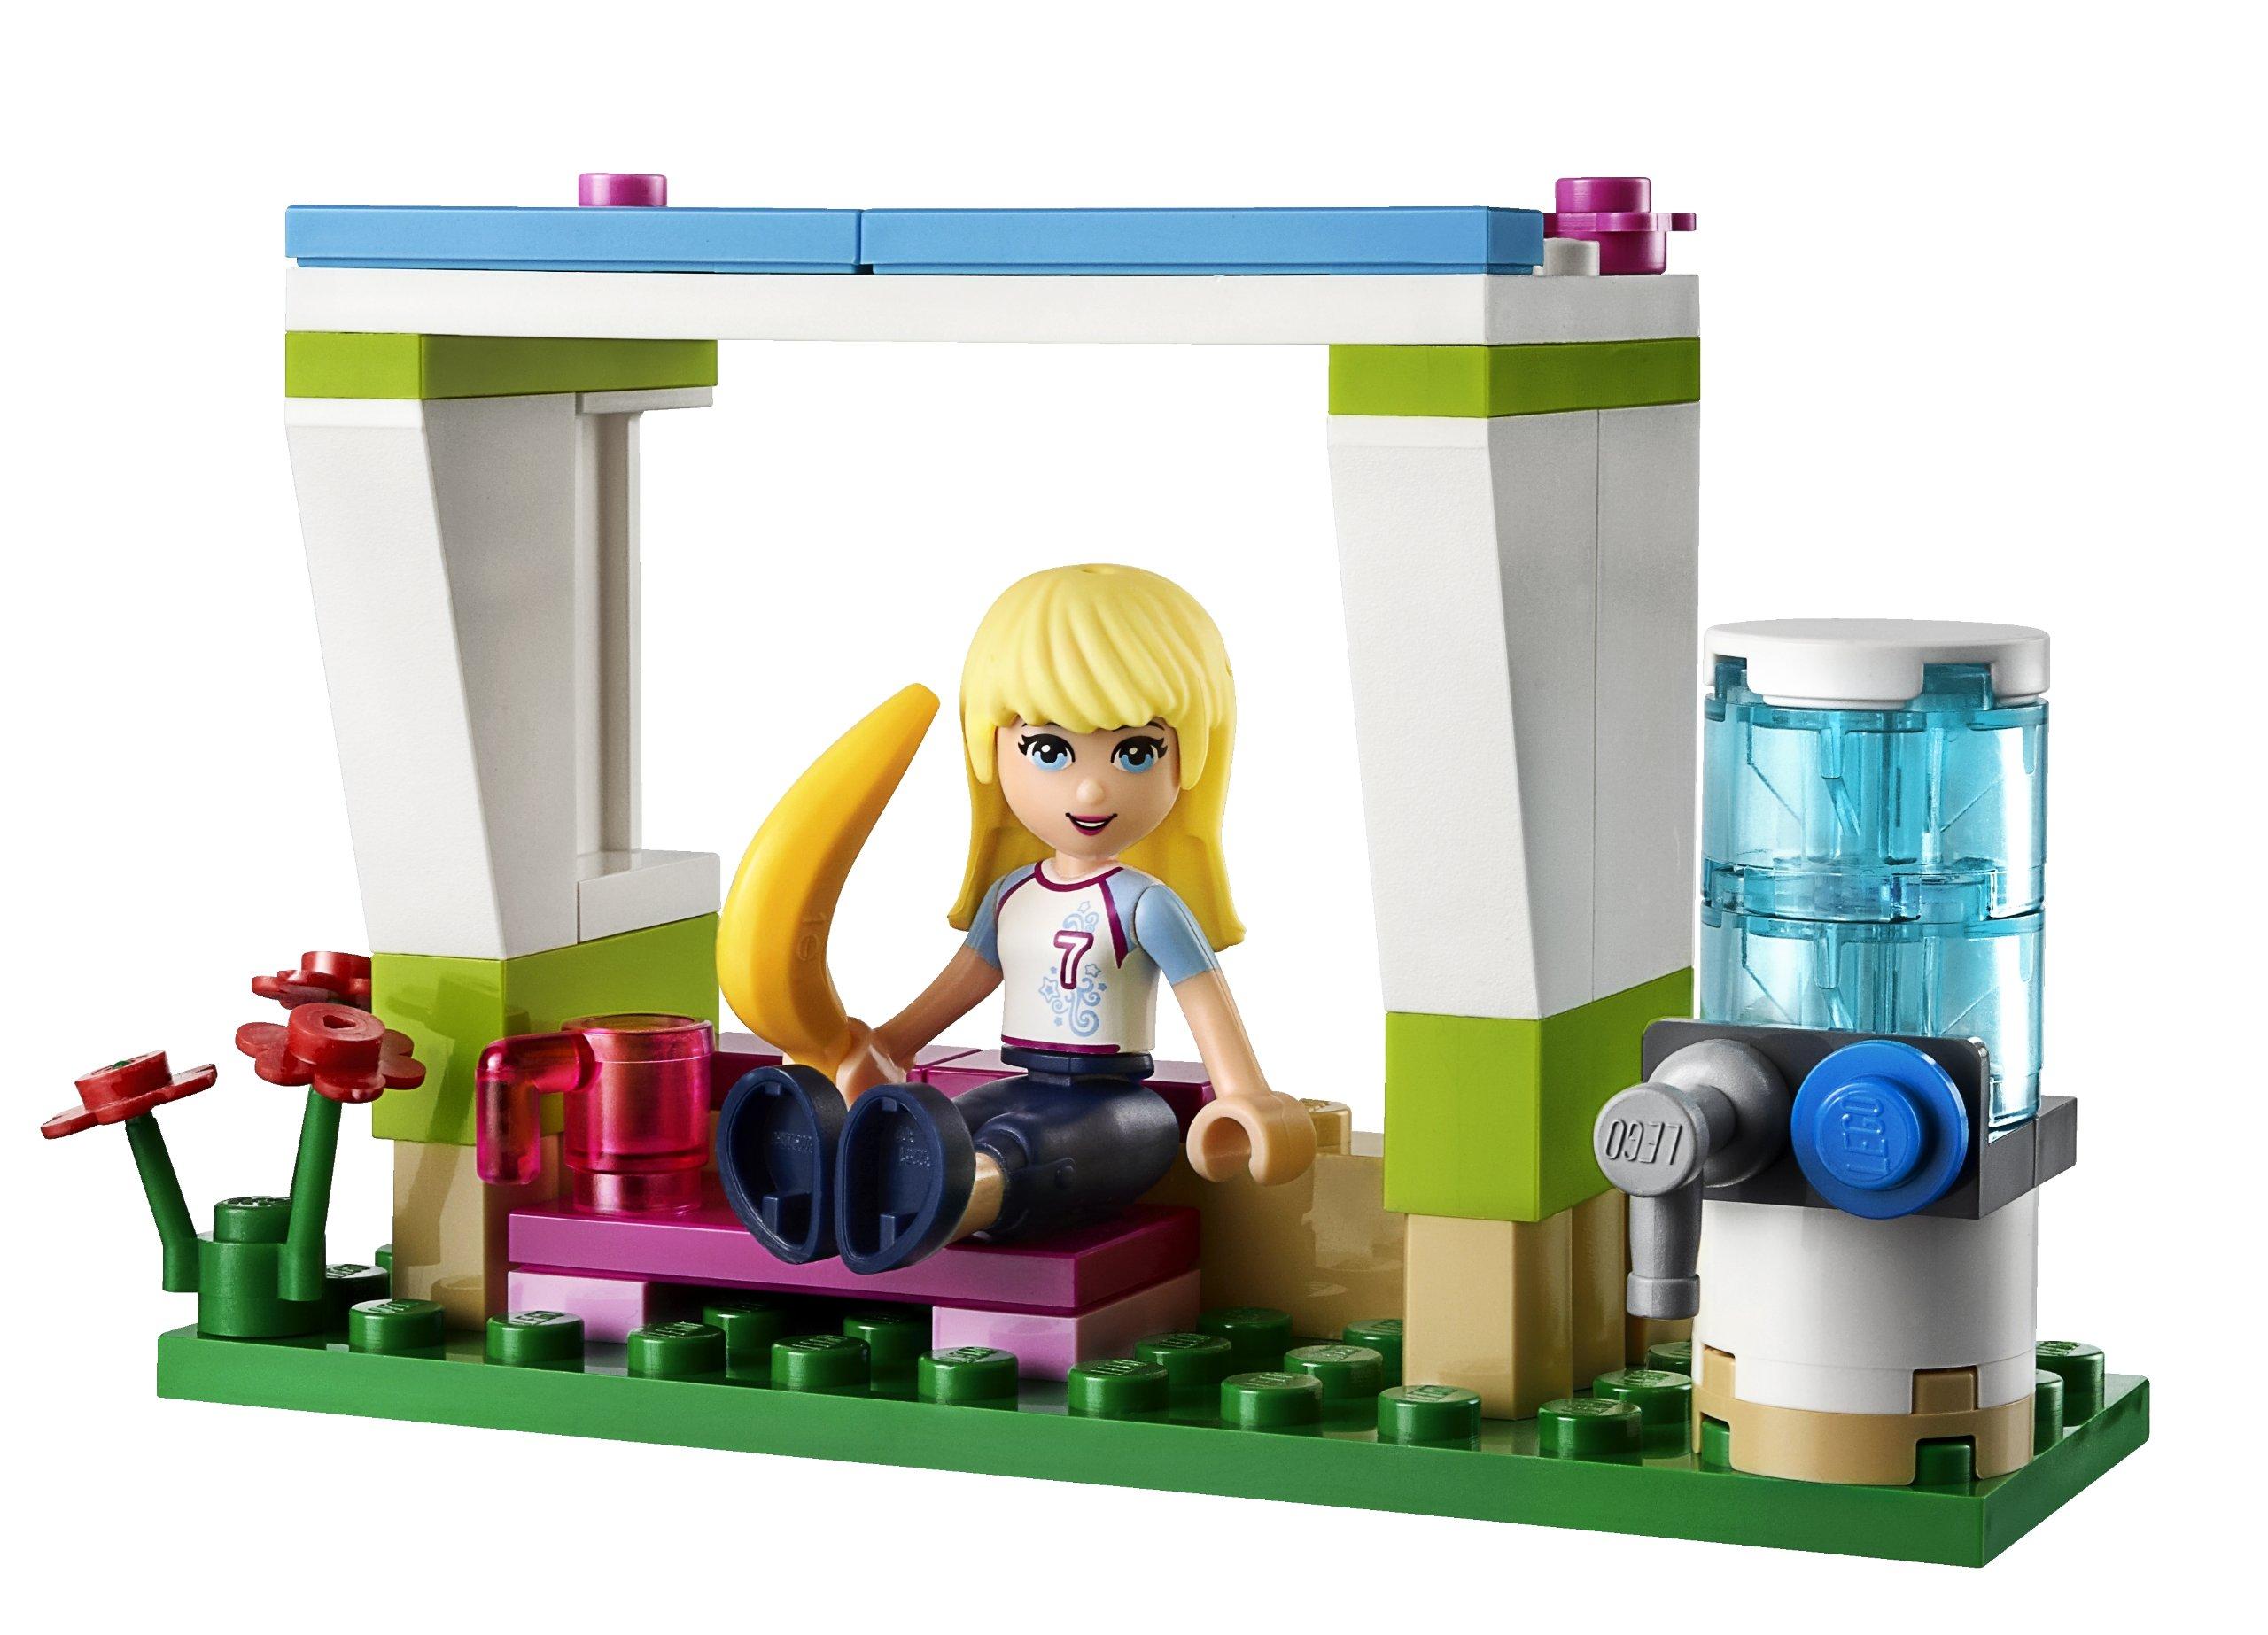 LEGO Friends Stephanie Soccer Practice 41011 - Buy Online ...